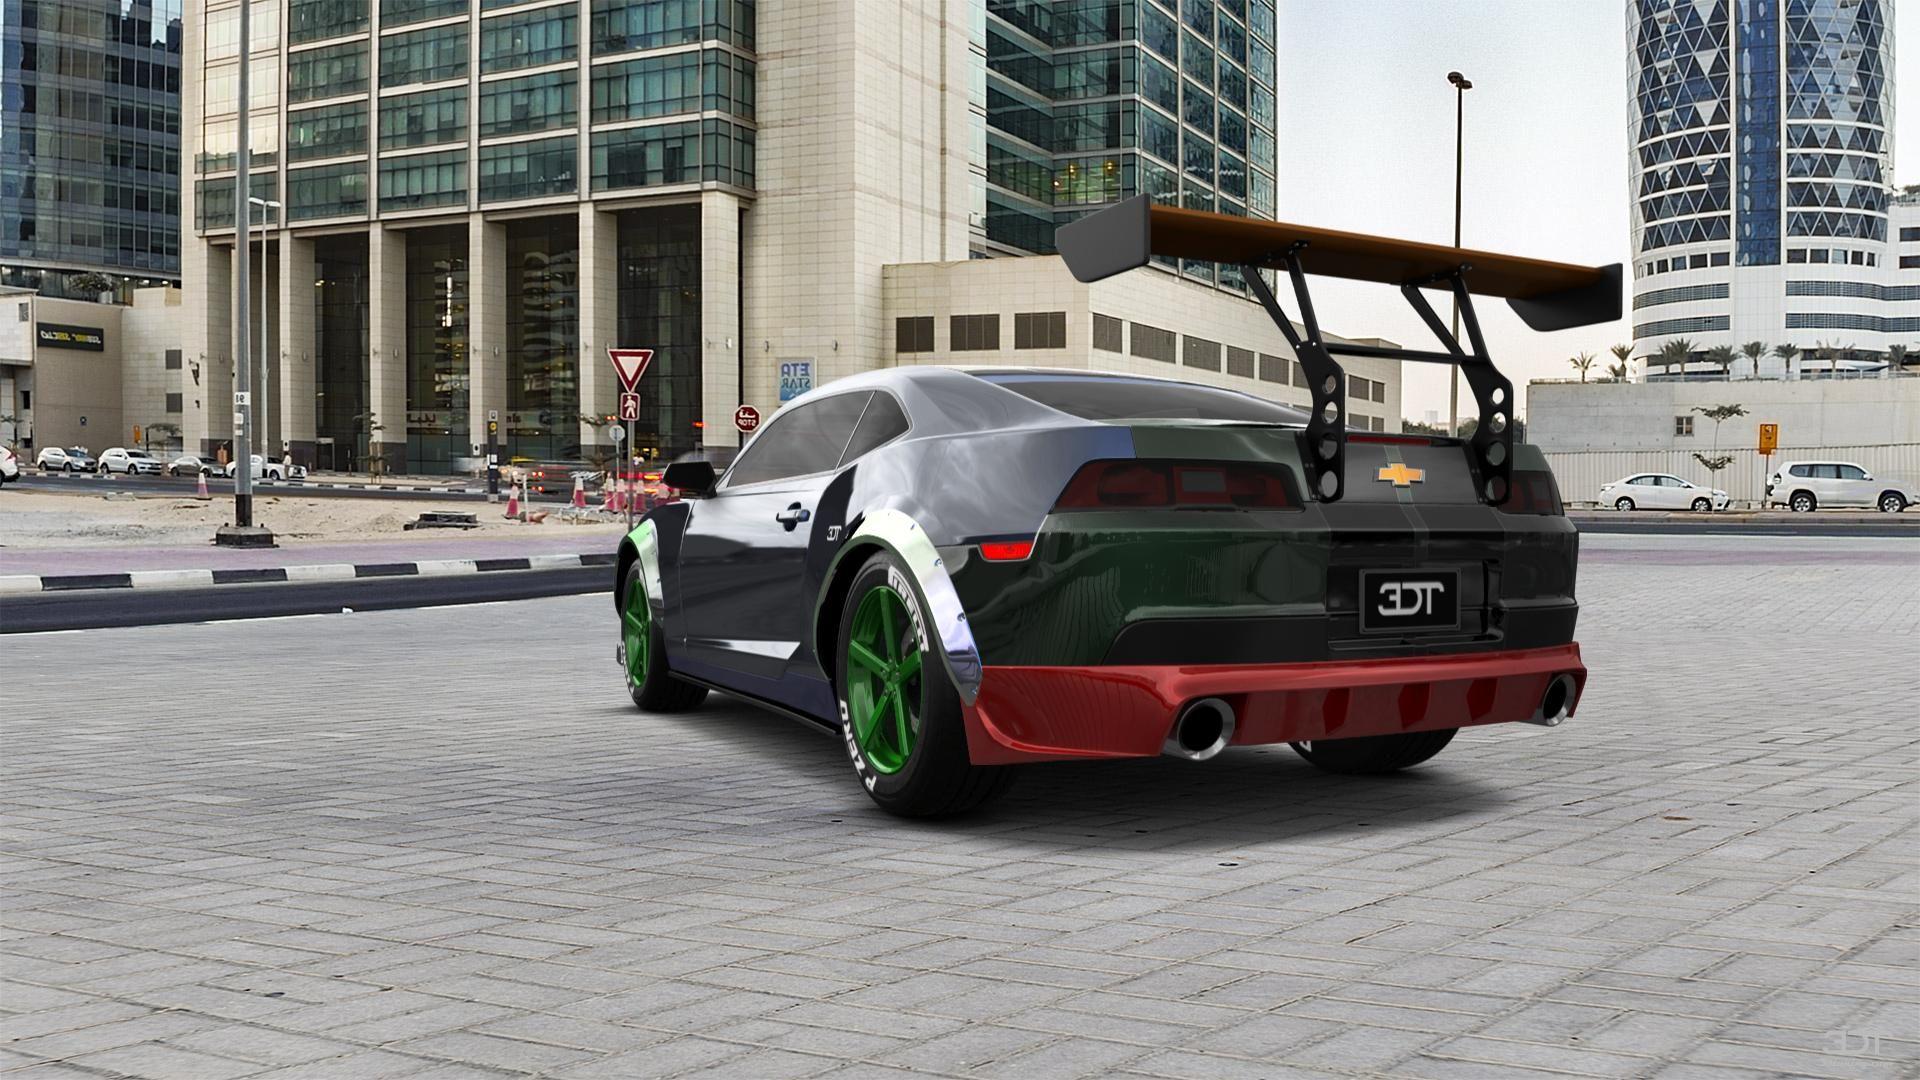 Checkout my tuning Chevrolet Camaro 2014 at 3DTuning